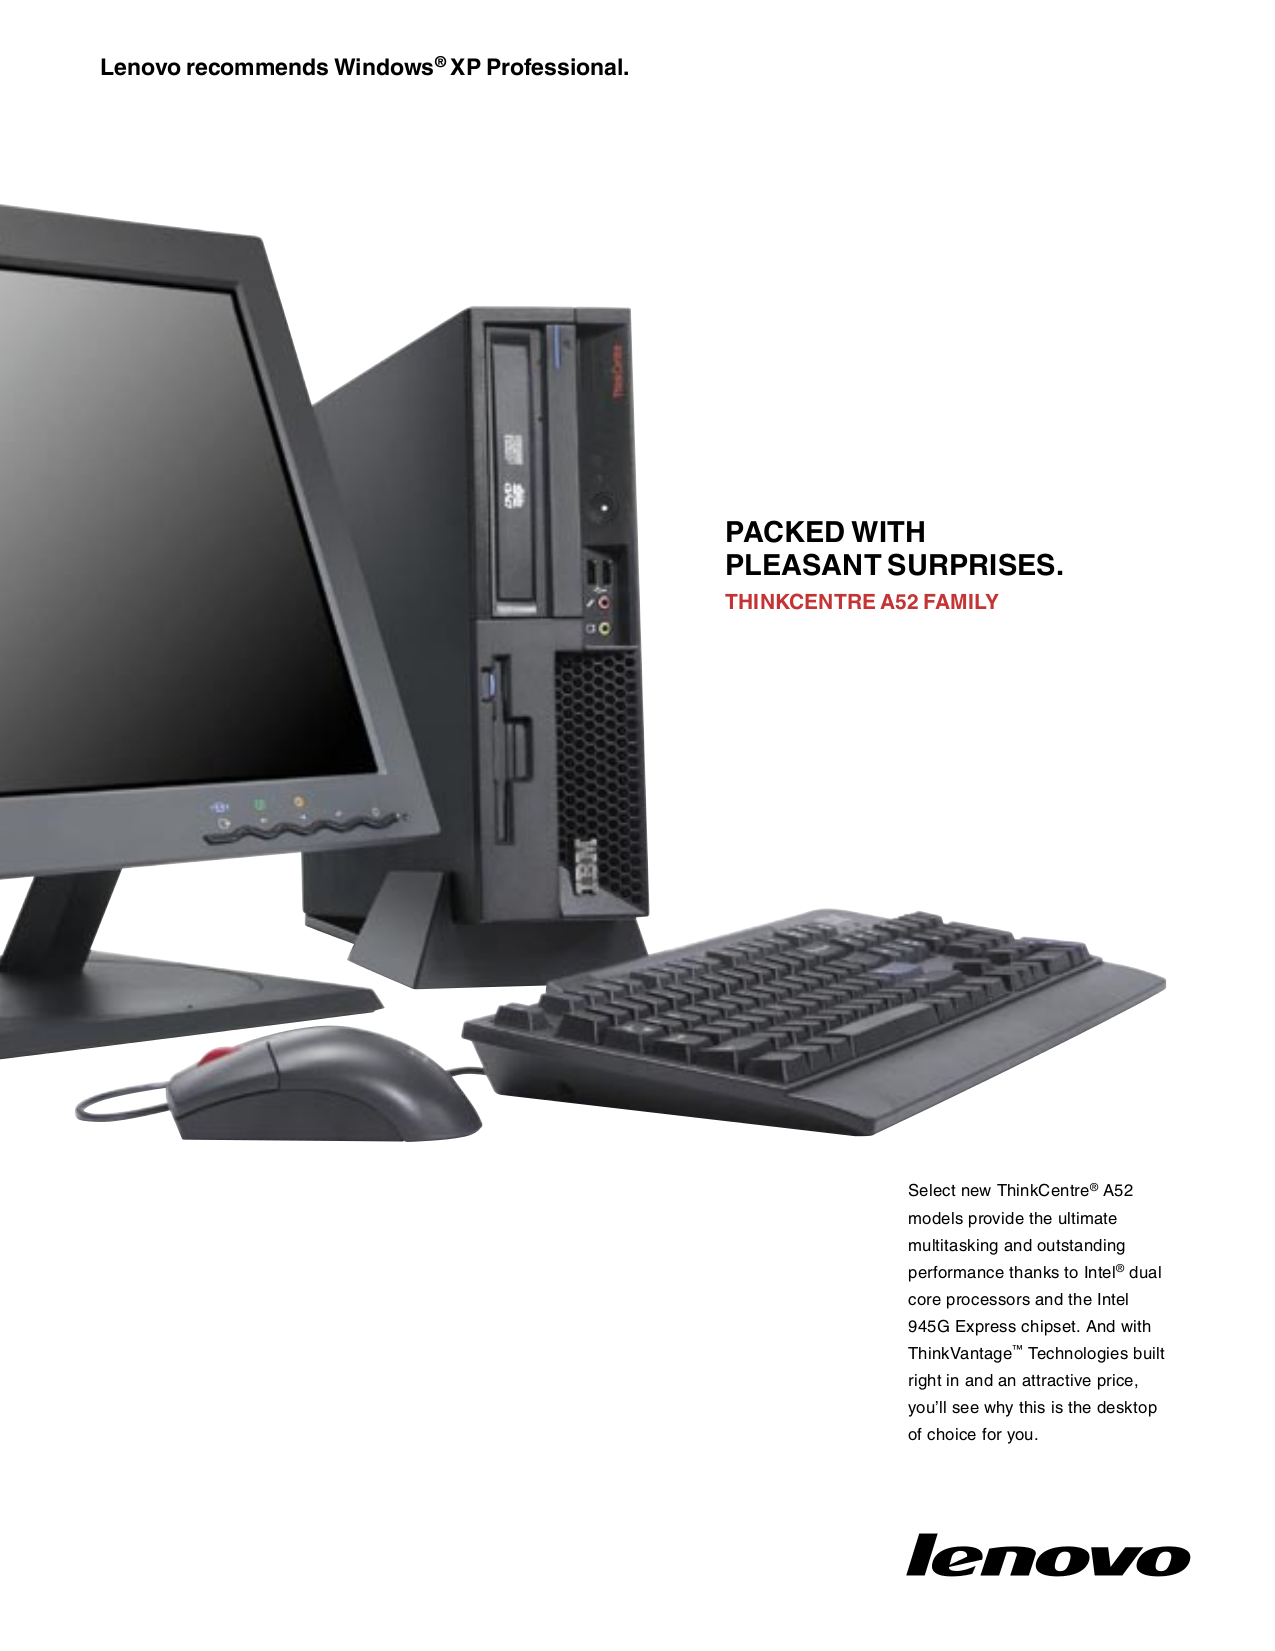 pdf for Lenovo Desktop ThinkCentre A51 8105 manual